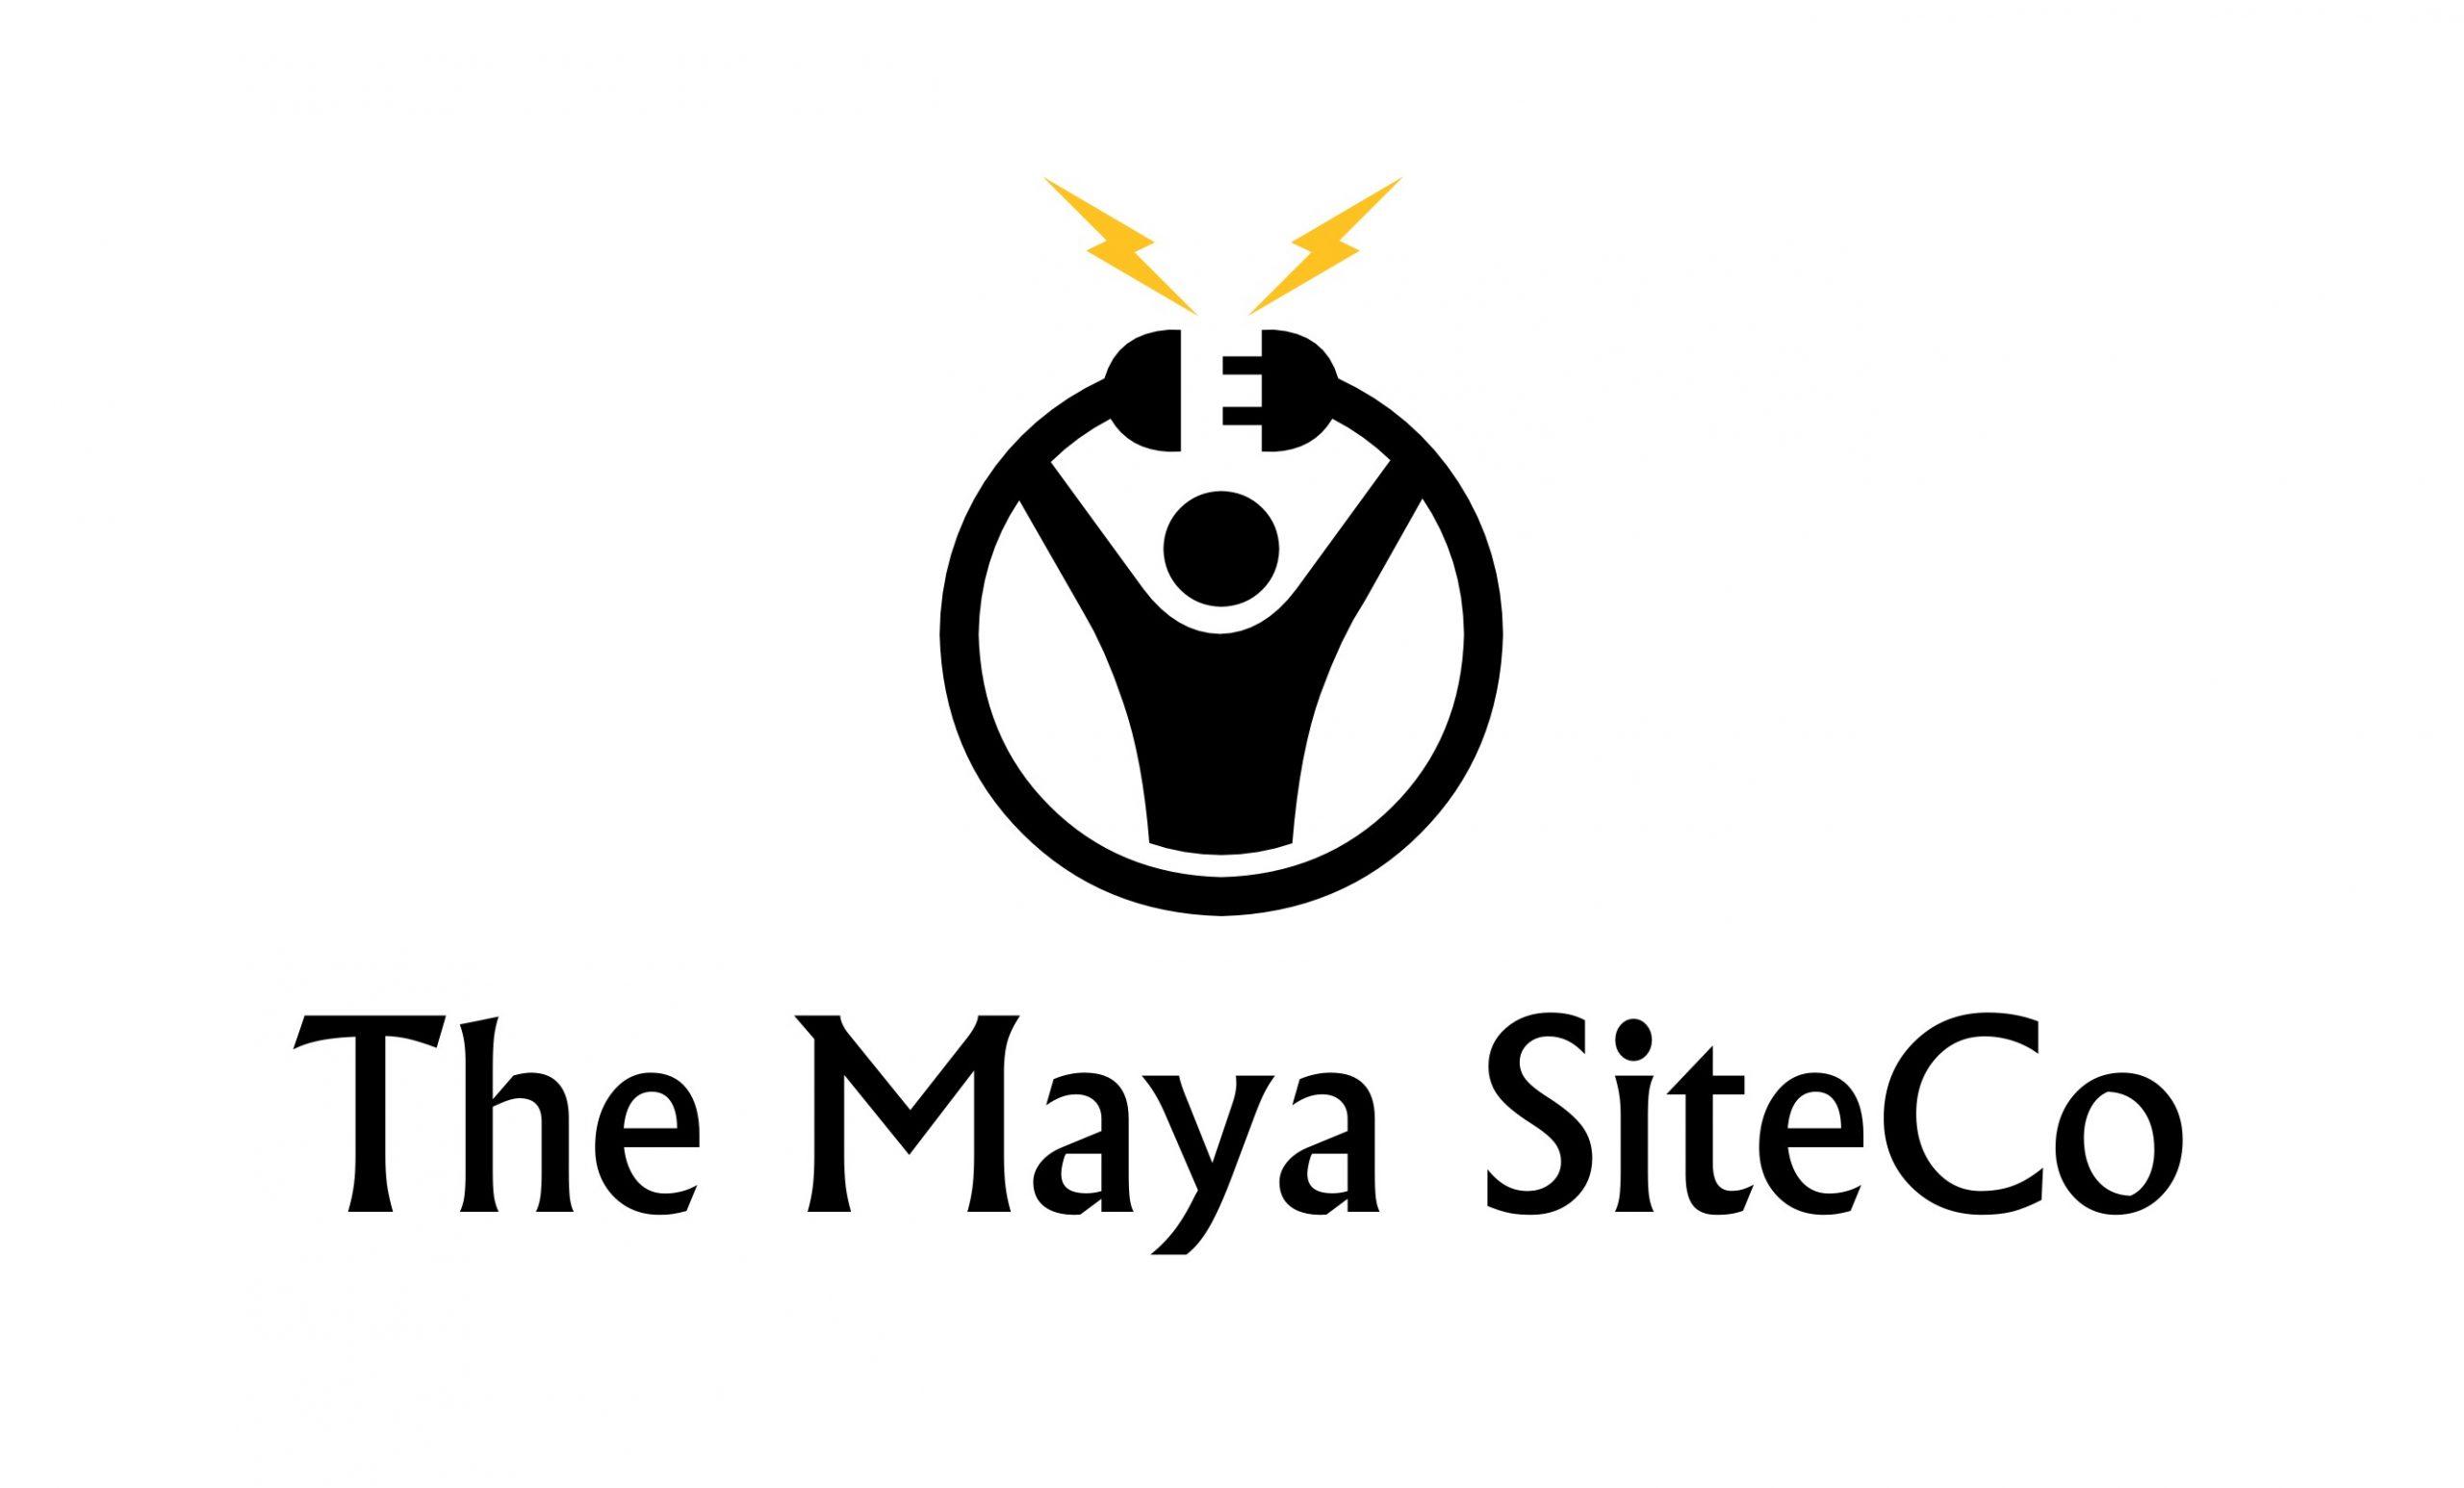 Logo der The Maya SiteCo GmbH